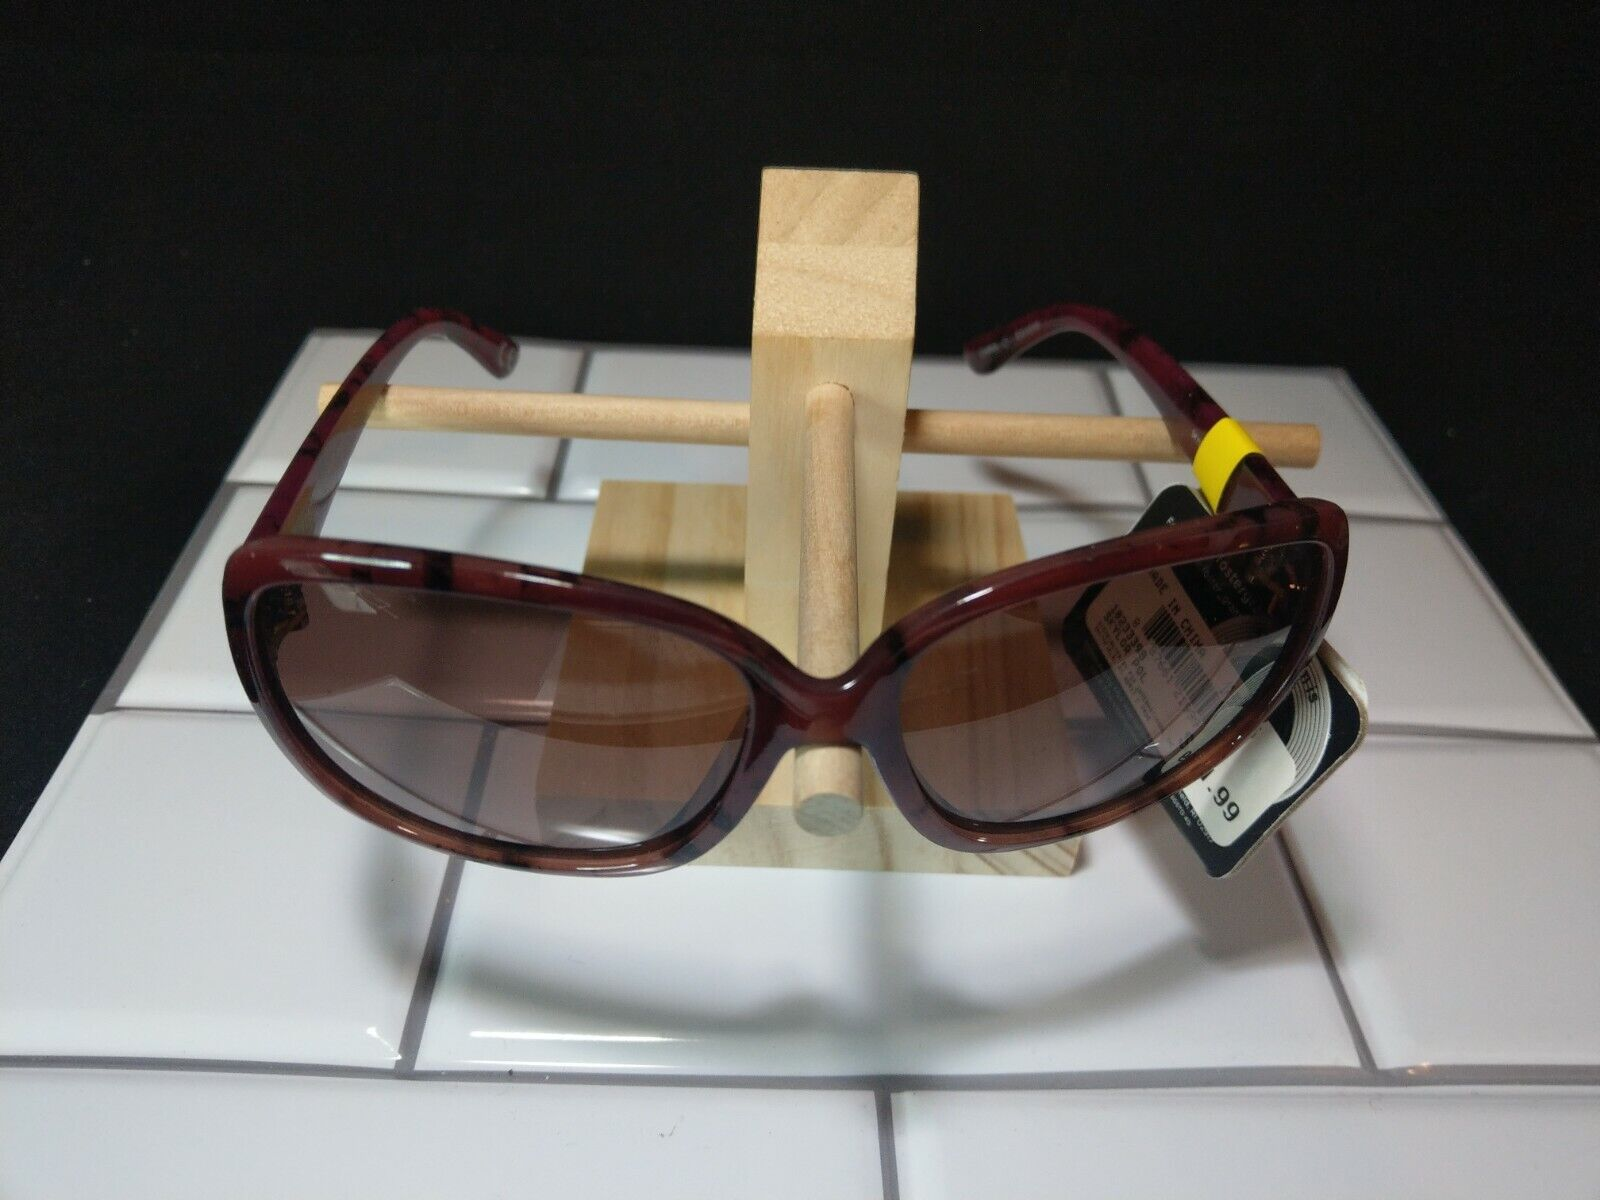 FOSTER GRANT Tortoiseshell Oversized Sunglasses POLARIZED 100% UVA UVB PROTECT